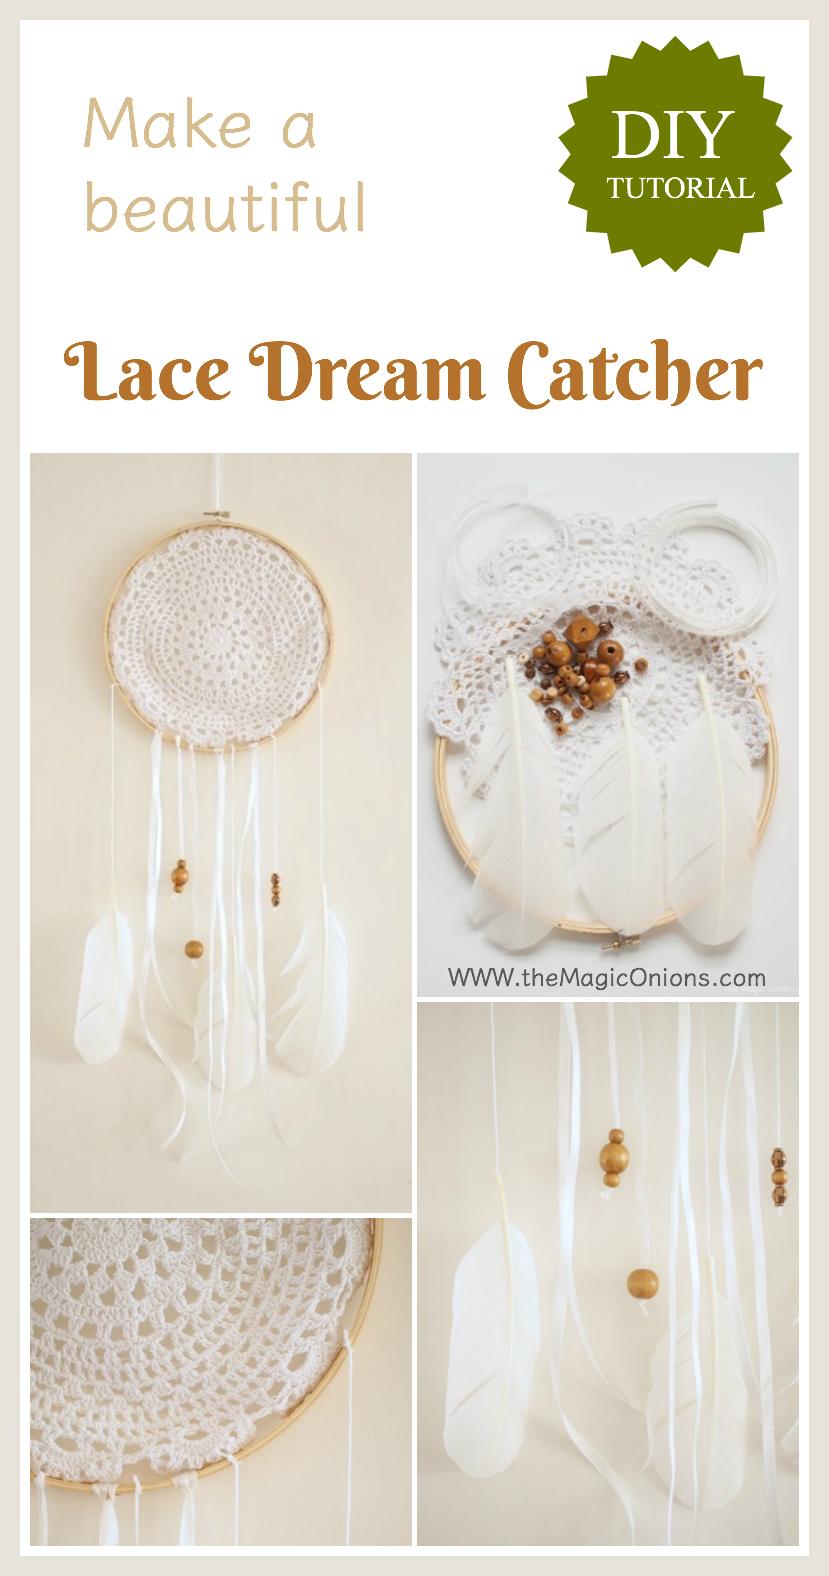 Lace Dream Catcher :: DIY Tutoiral